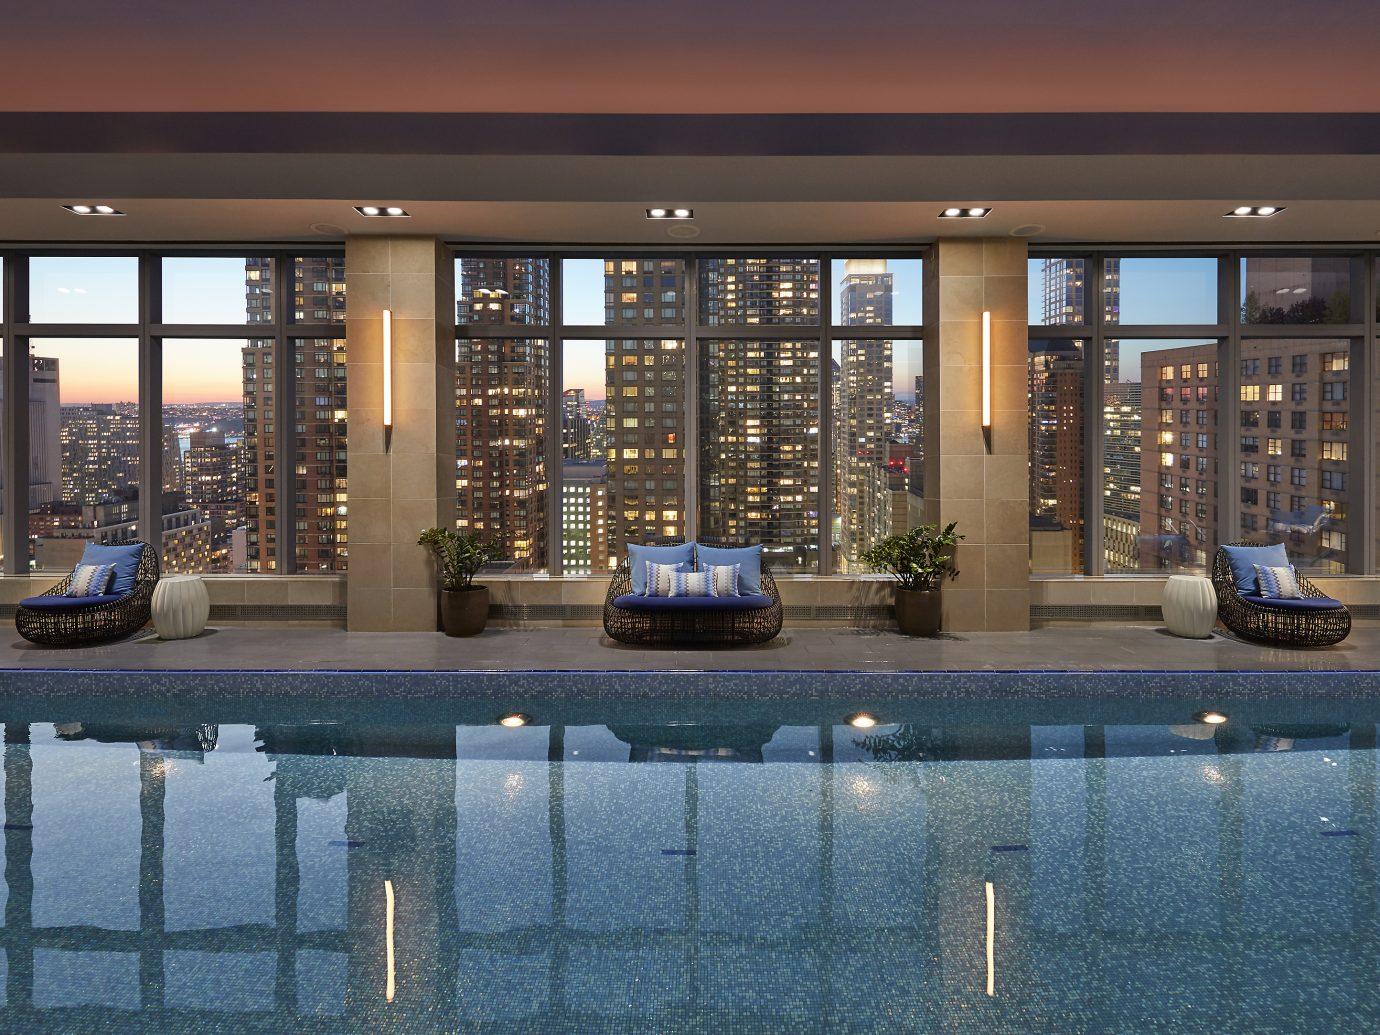 Wellness pool at dusk overlooking NYC at Mandarin Oriental